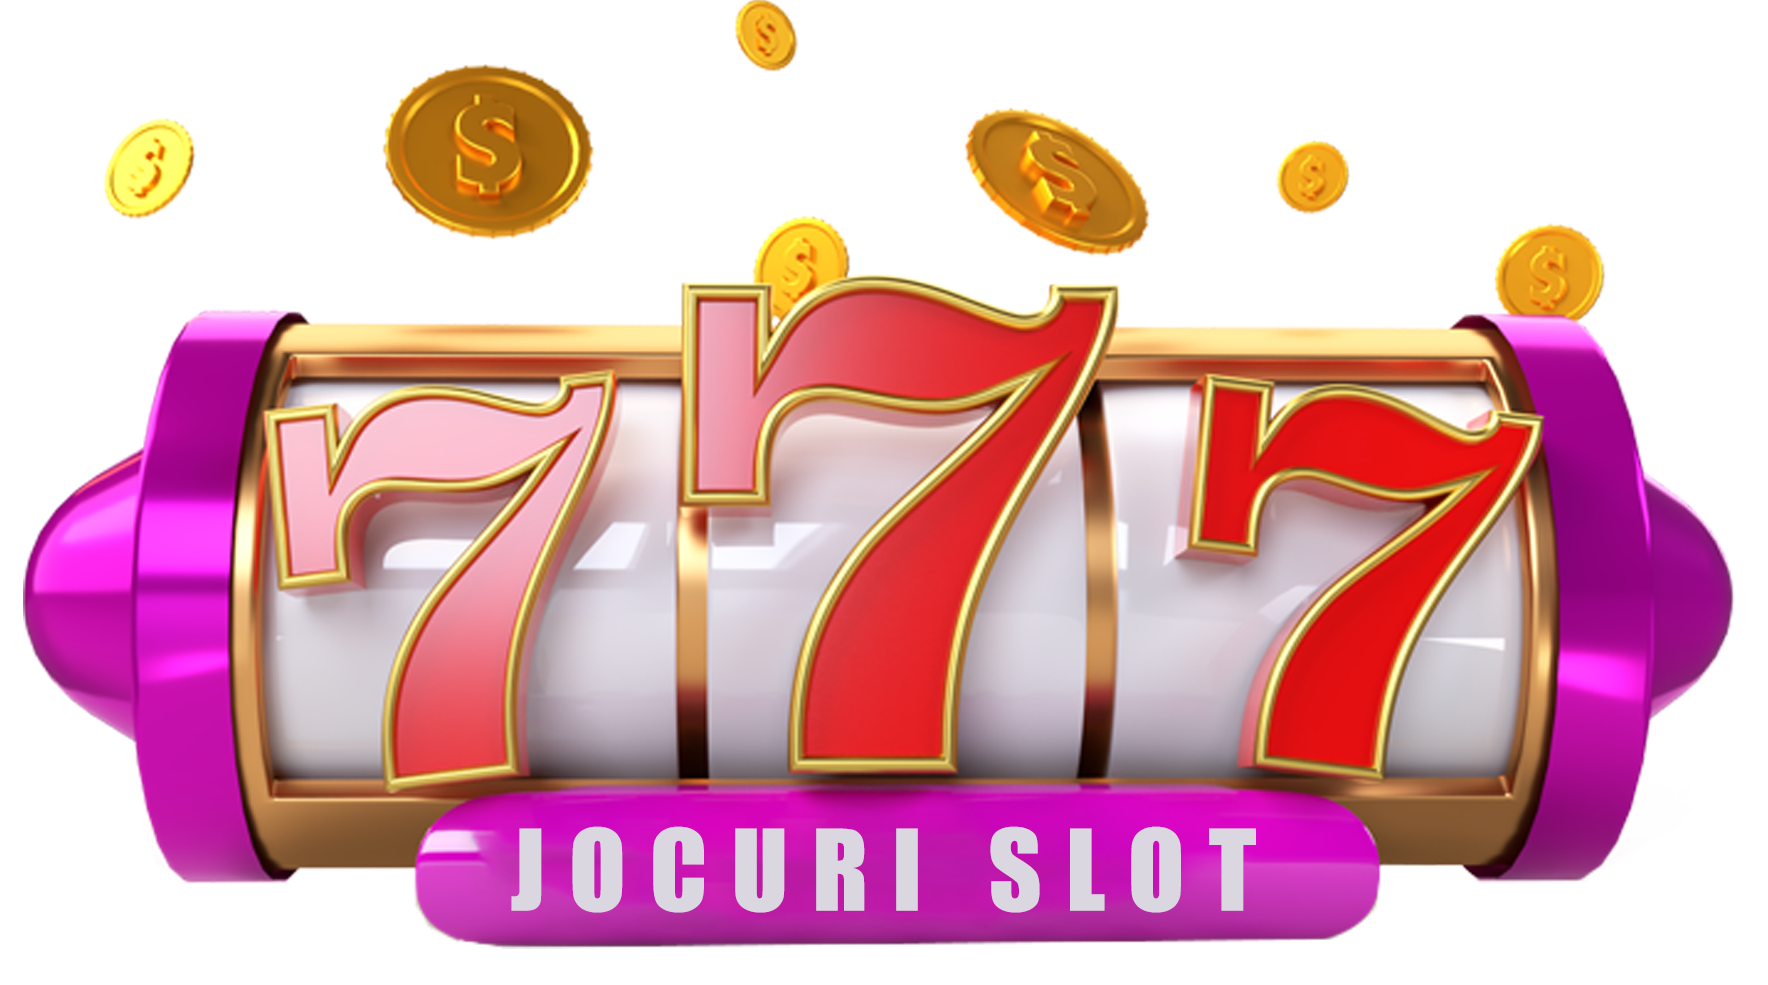 Jocuri slot online